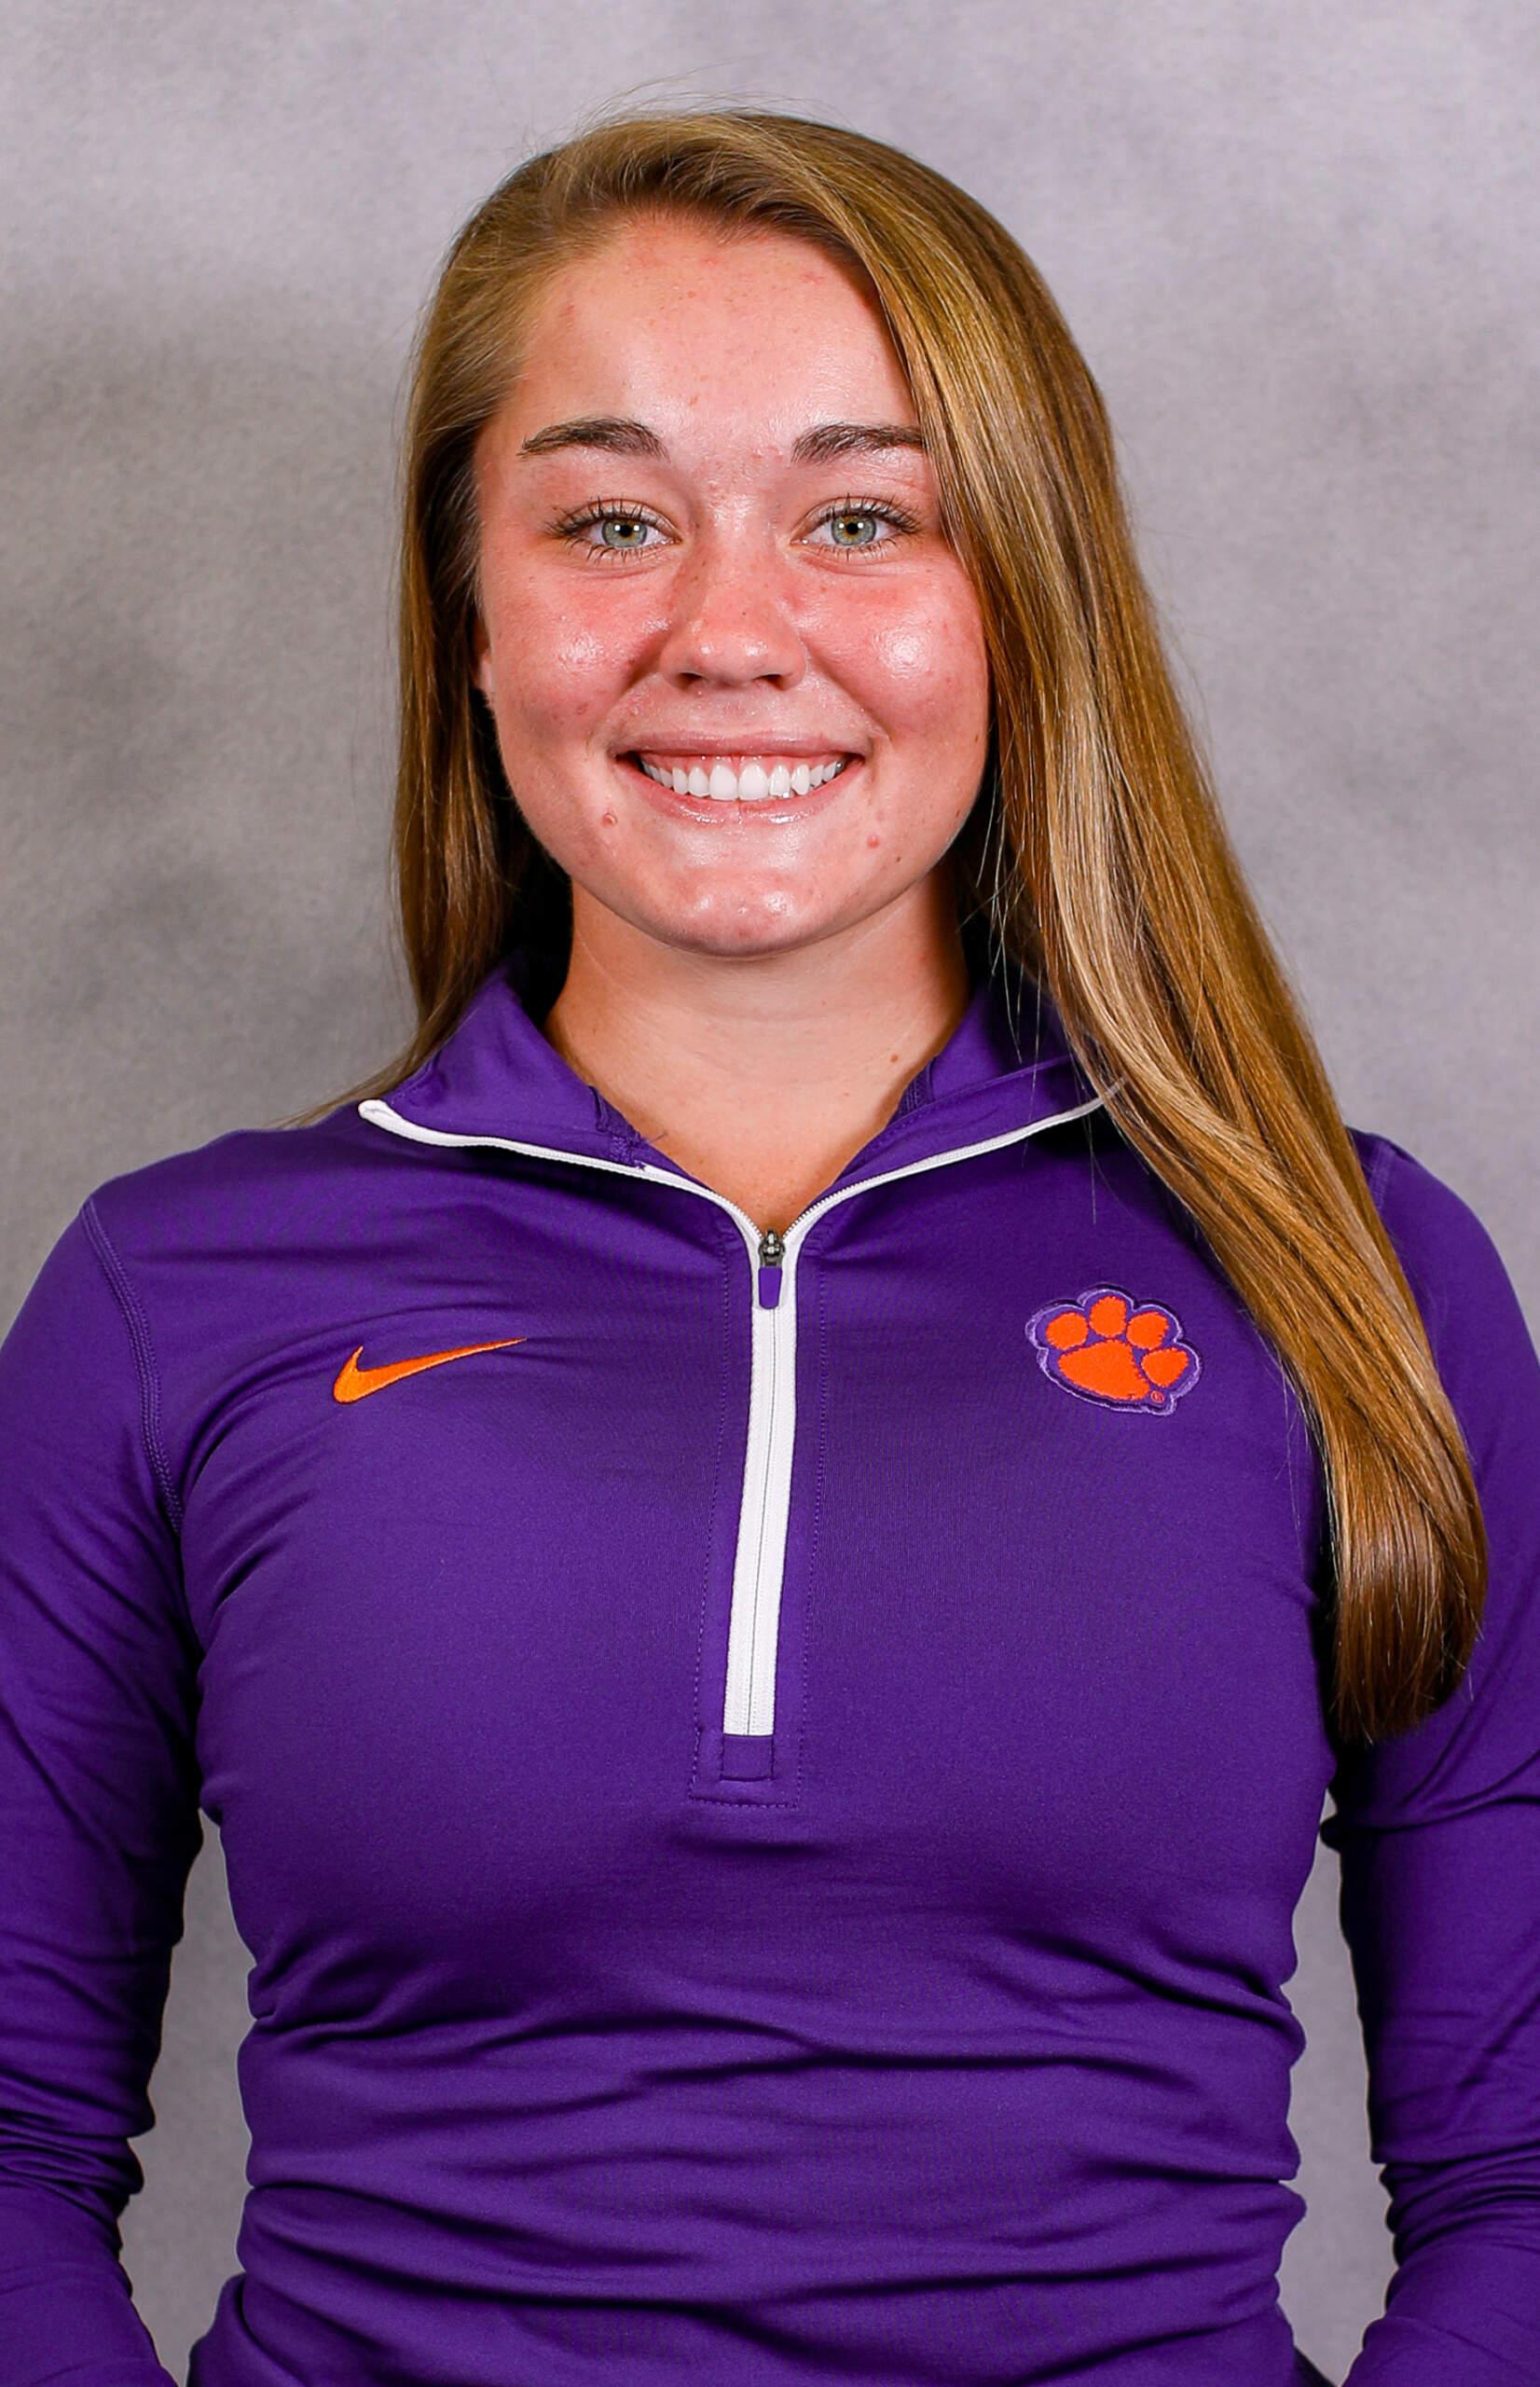 Makayla Mills - Women's Tennis - Clemson University Athletics